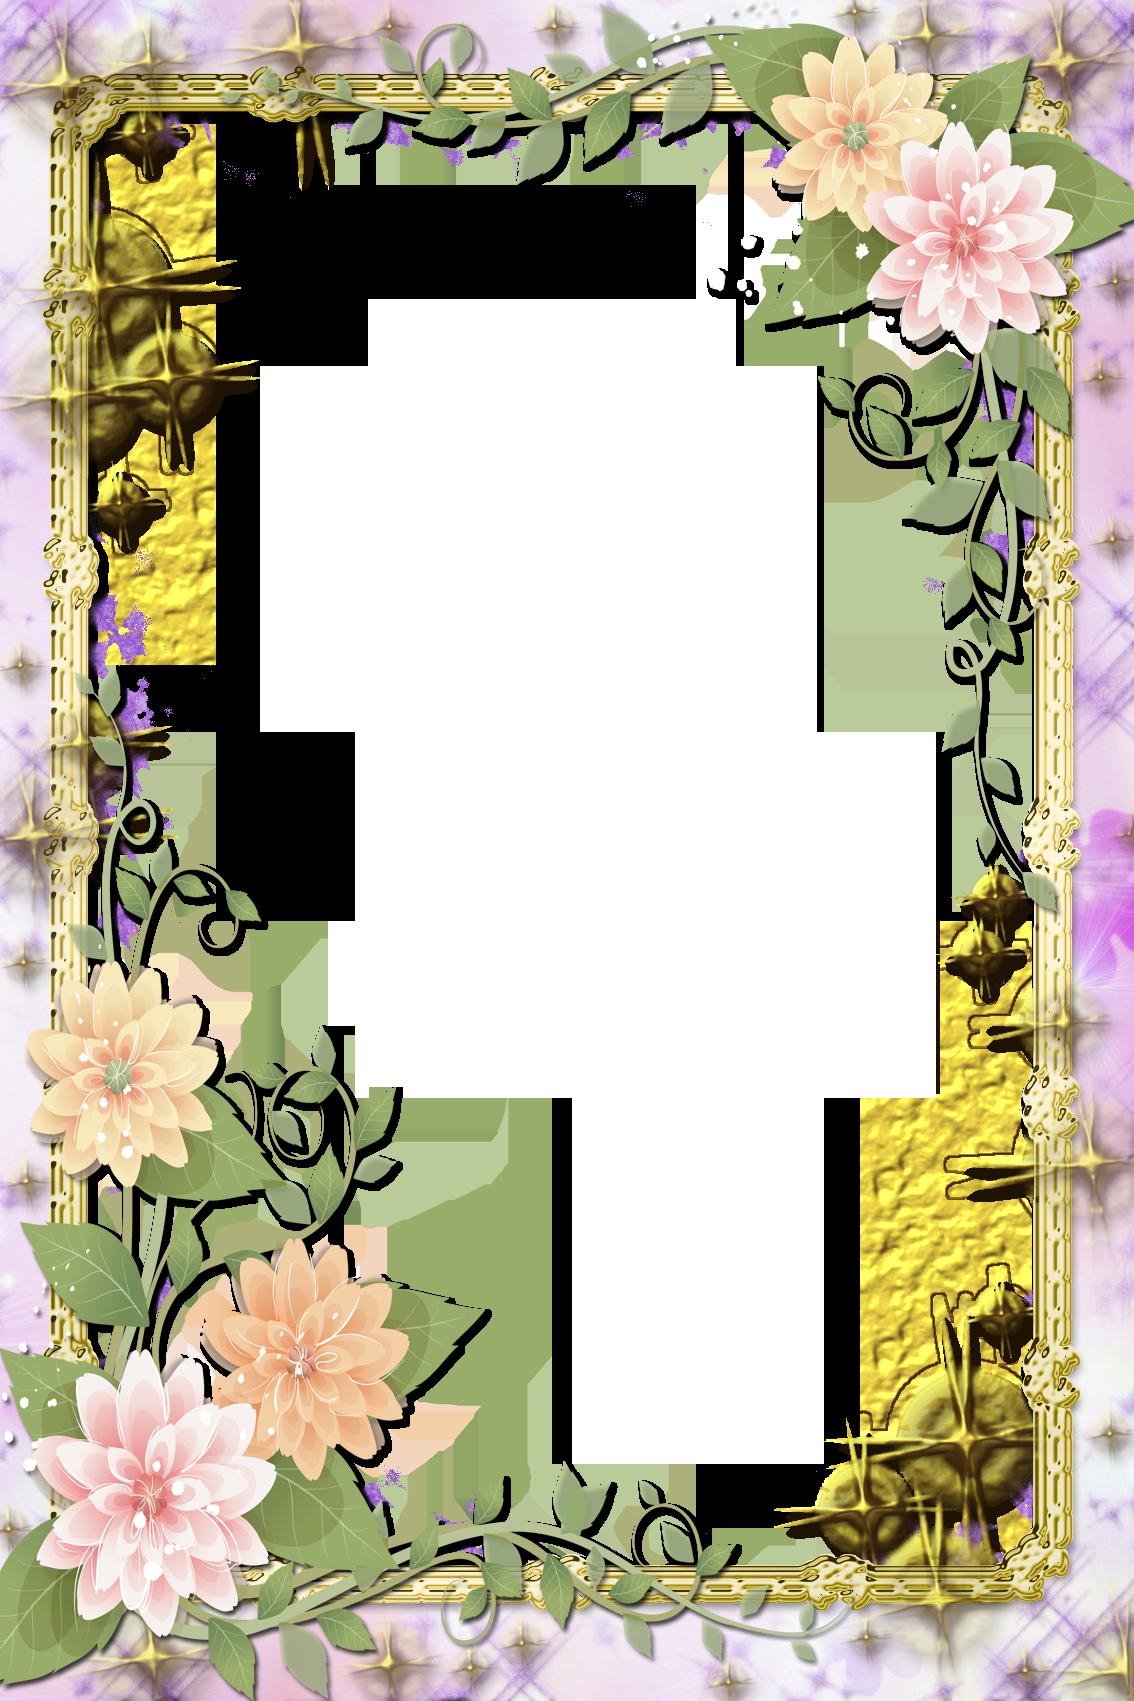 Картинки картинки, открытка вертикальная формат